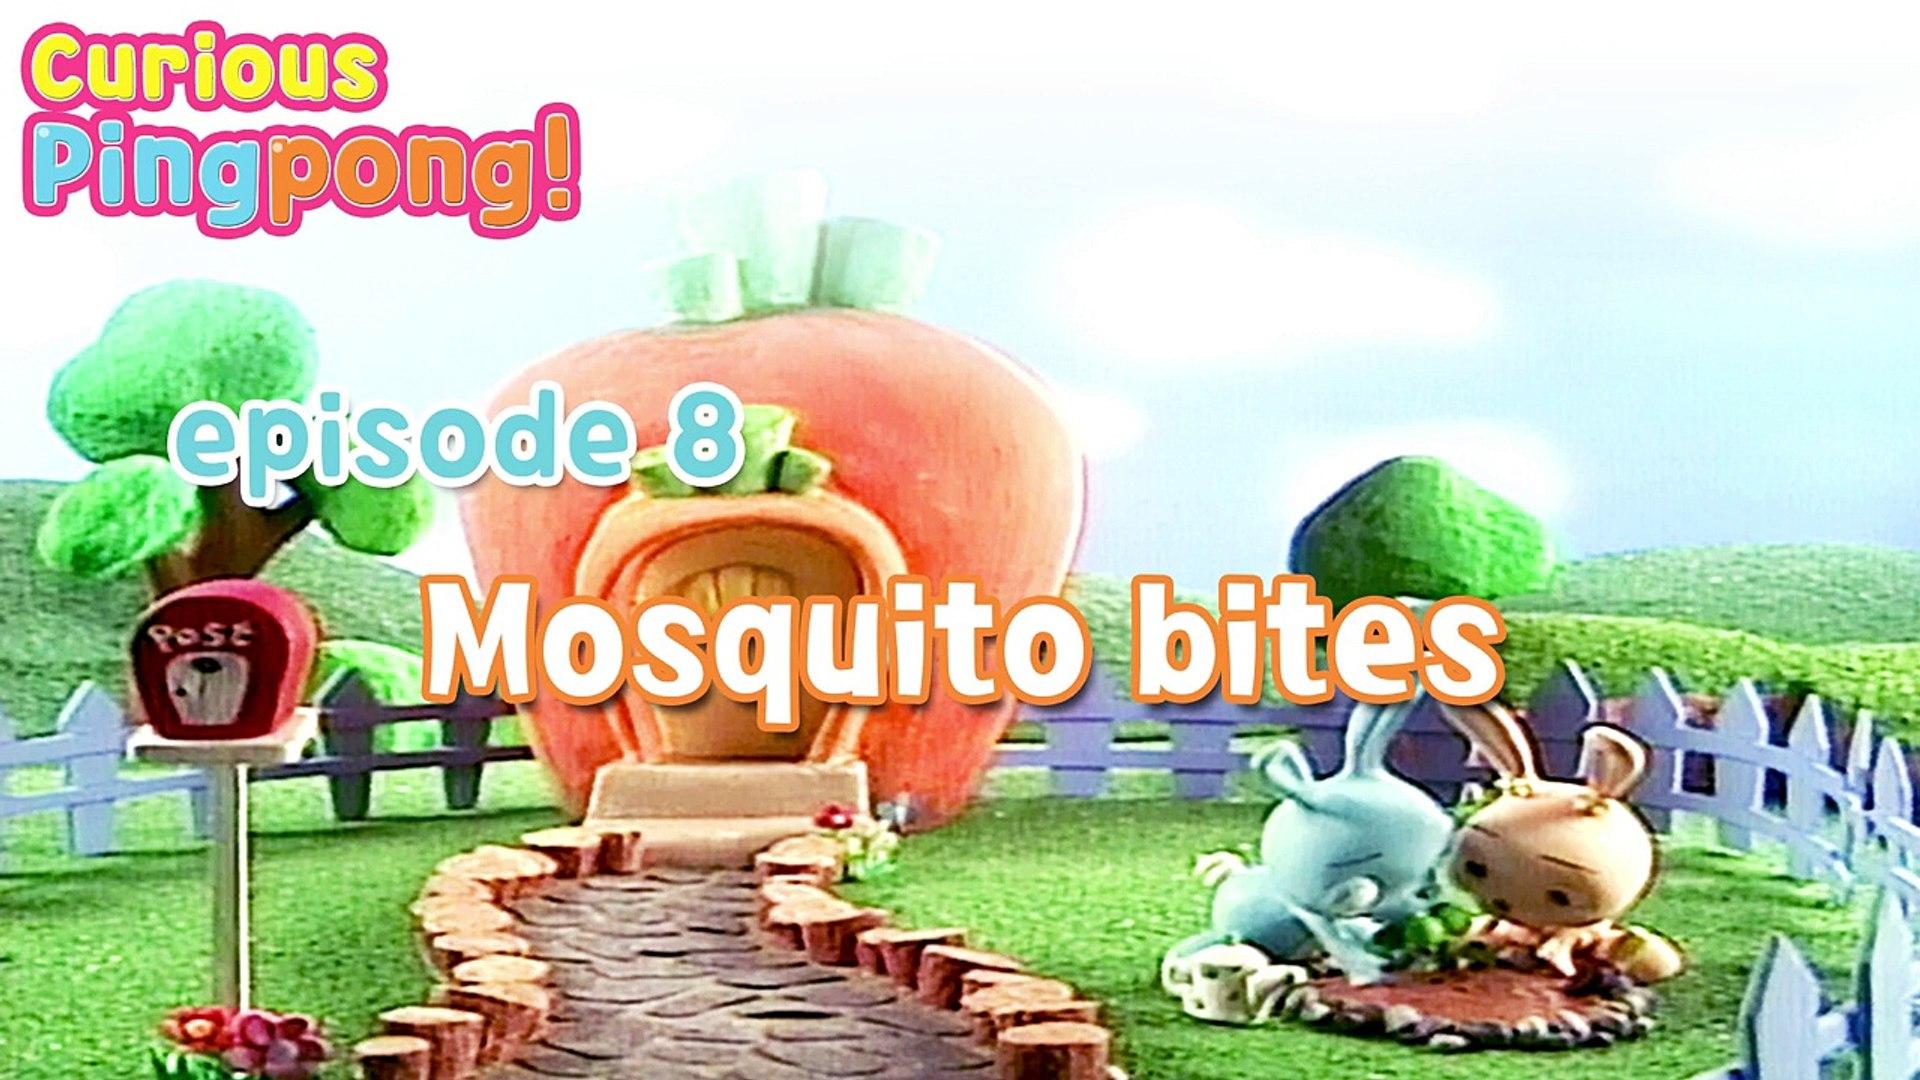 [Curious Ping Pong ] #17 Ubiquitous | Kids Animation Series | Education contents